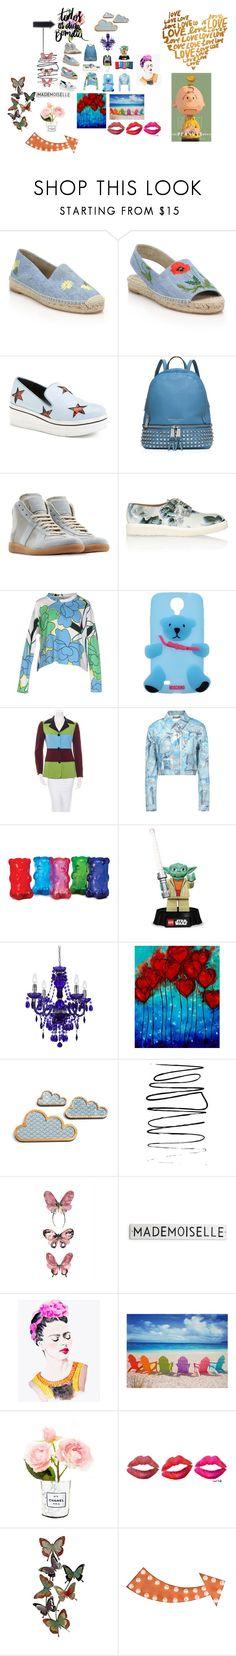 All Blue by rosastreet on Polyvore featuring moda, Marni, Moschino, Maison Margiela, STELLA McCARTNEY, MICHAEL Michael Kors, AF Lighting, Dot & Bo, Lego and Chanel